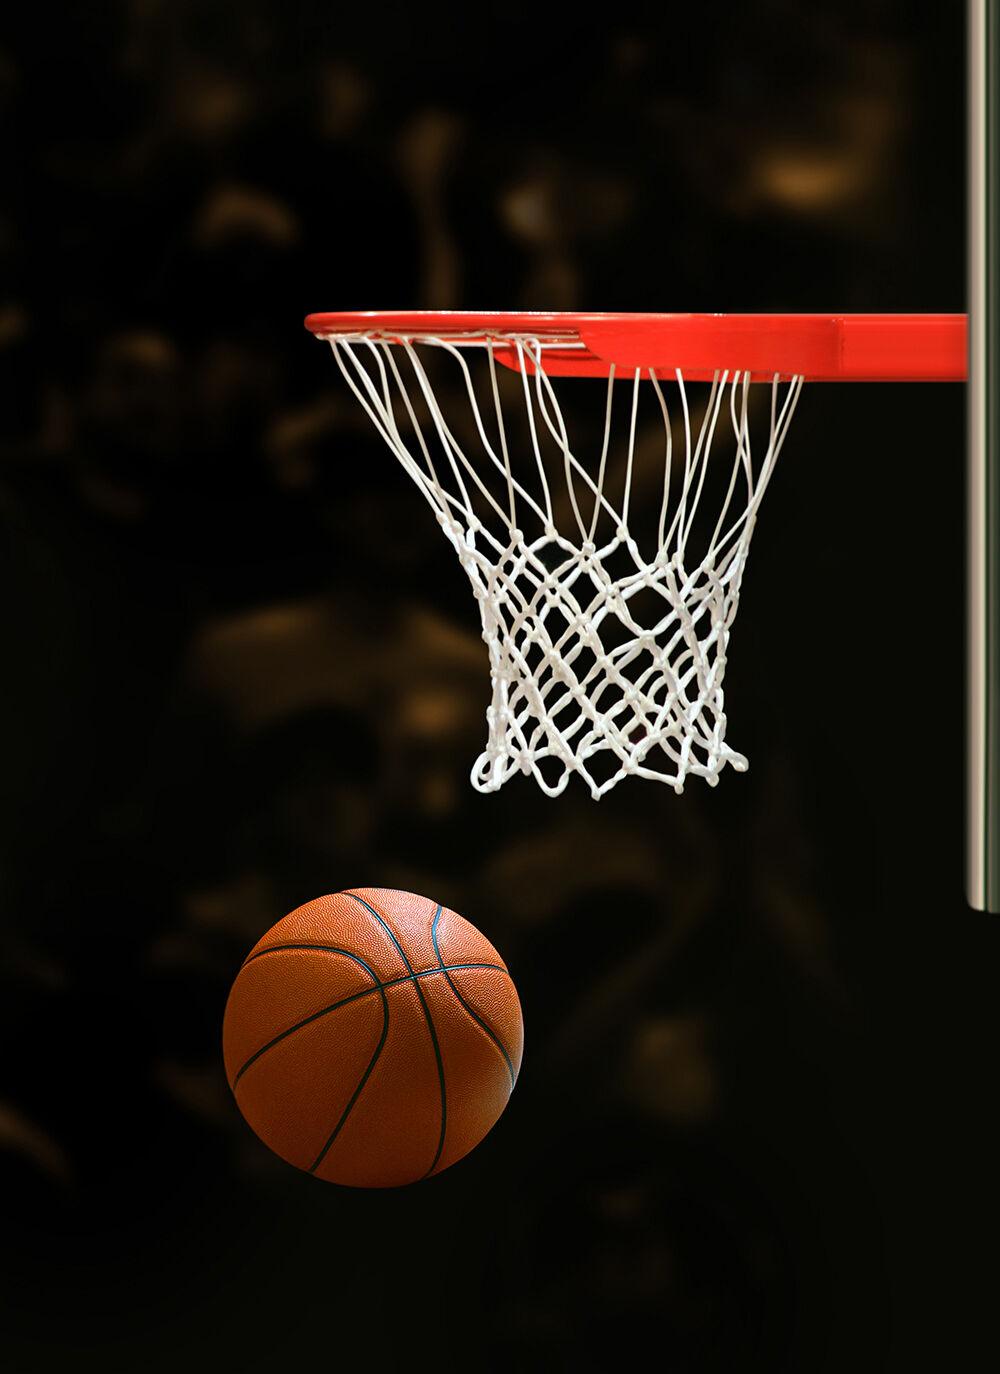 3D Basketball Hoop Photo Papier Peint en Autocollant Murale Plafond Chambre Art